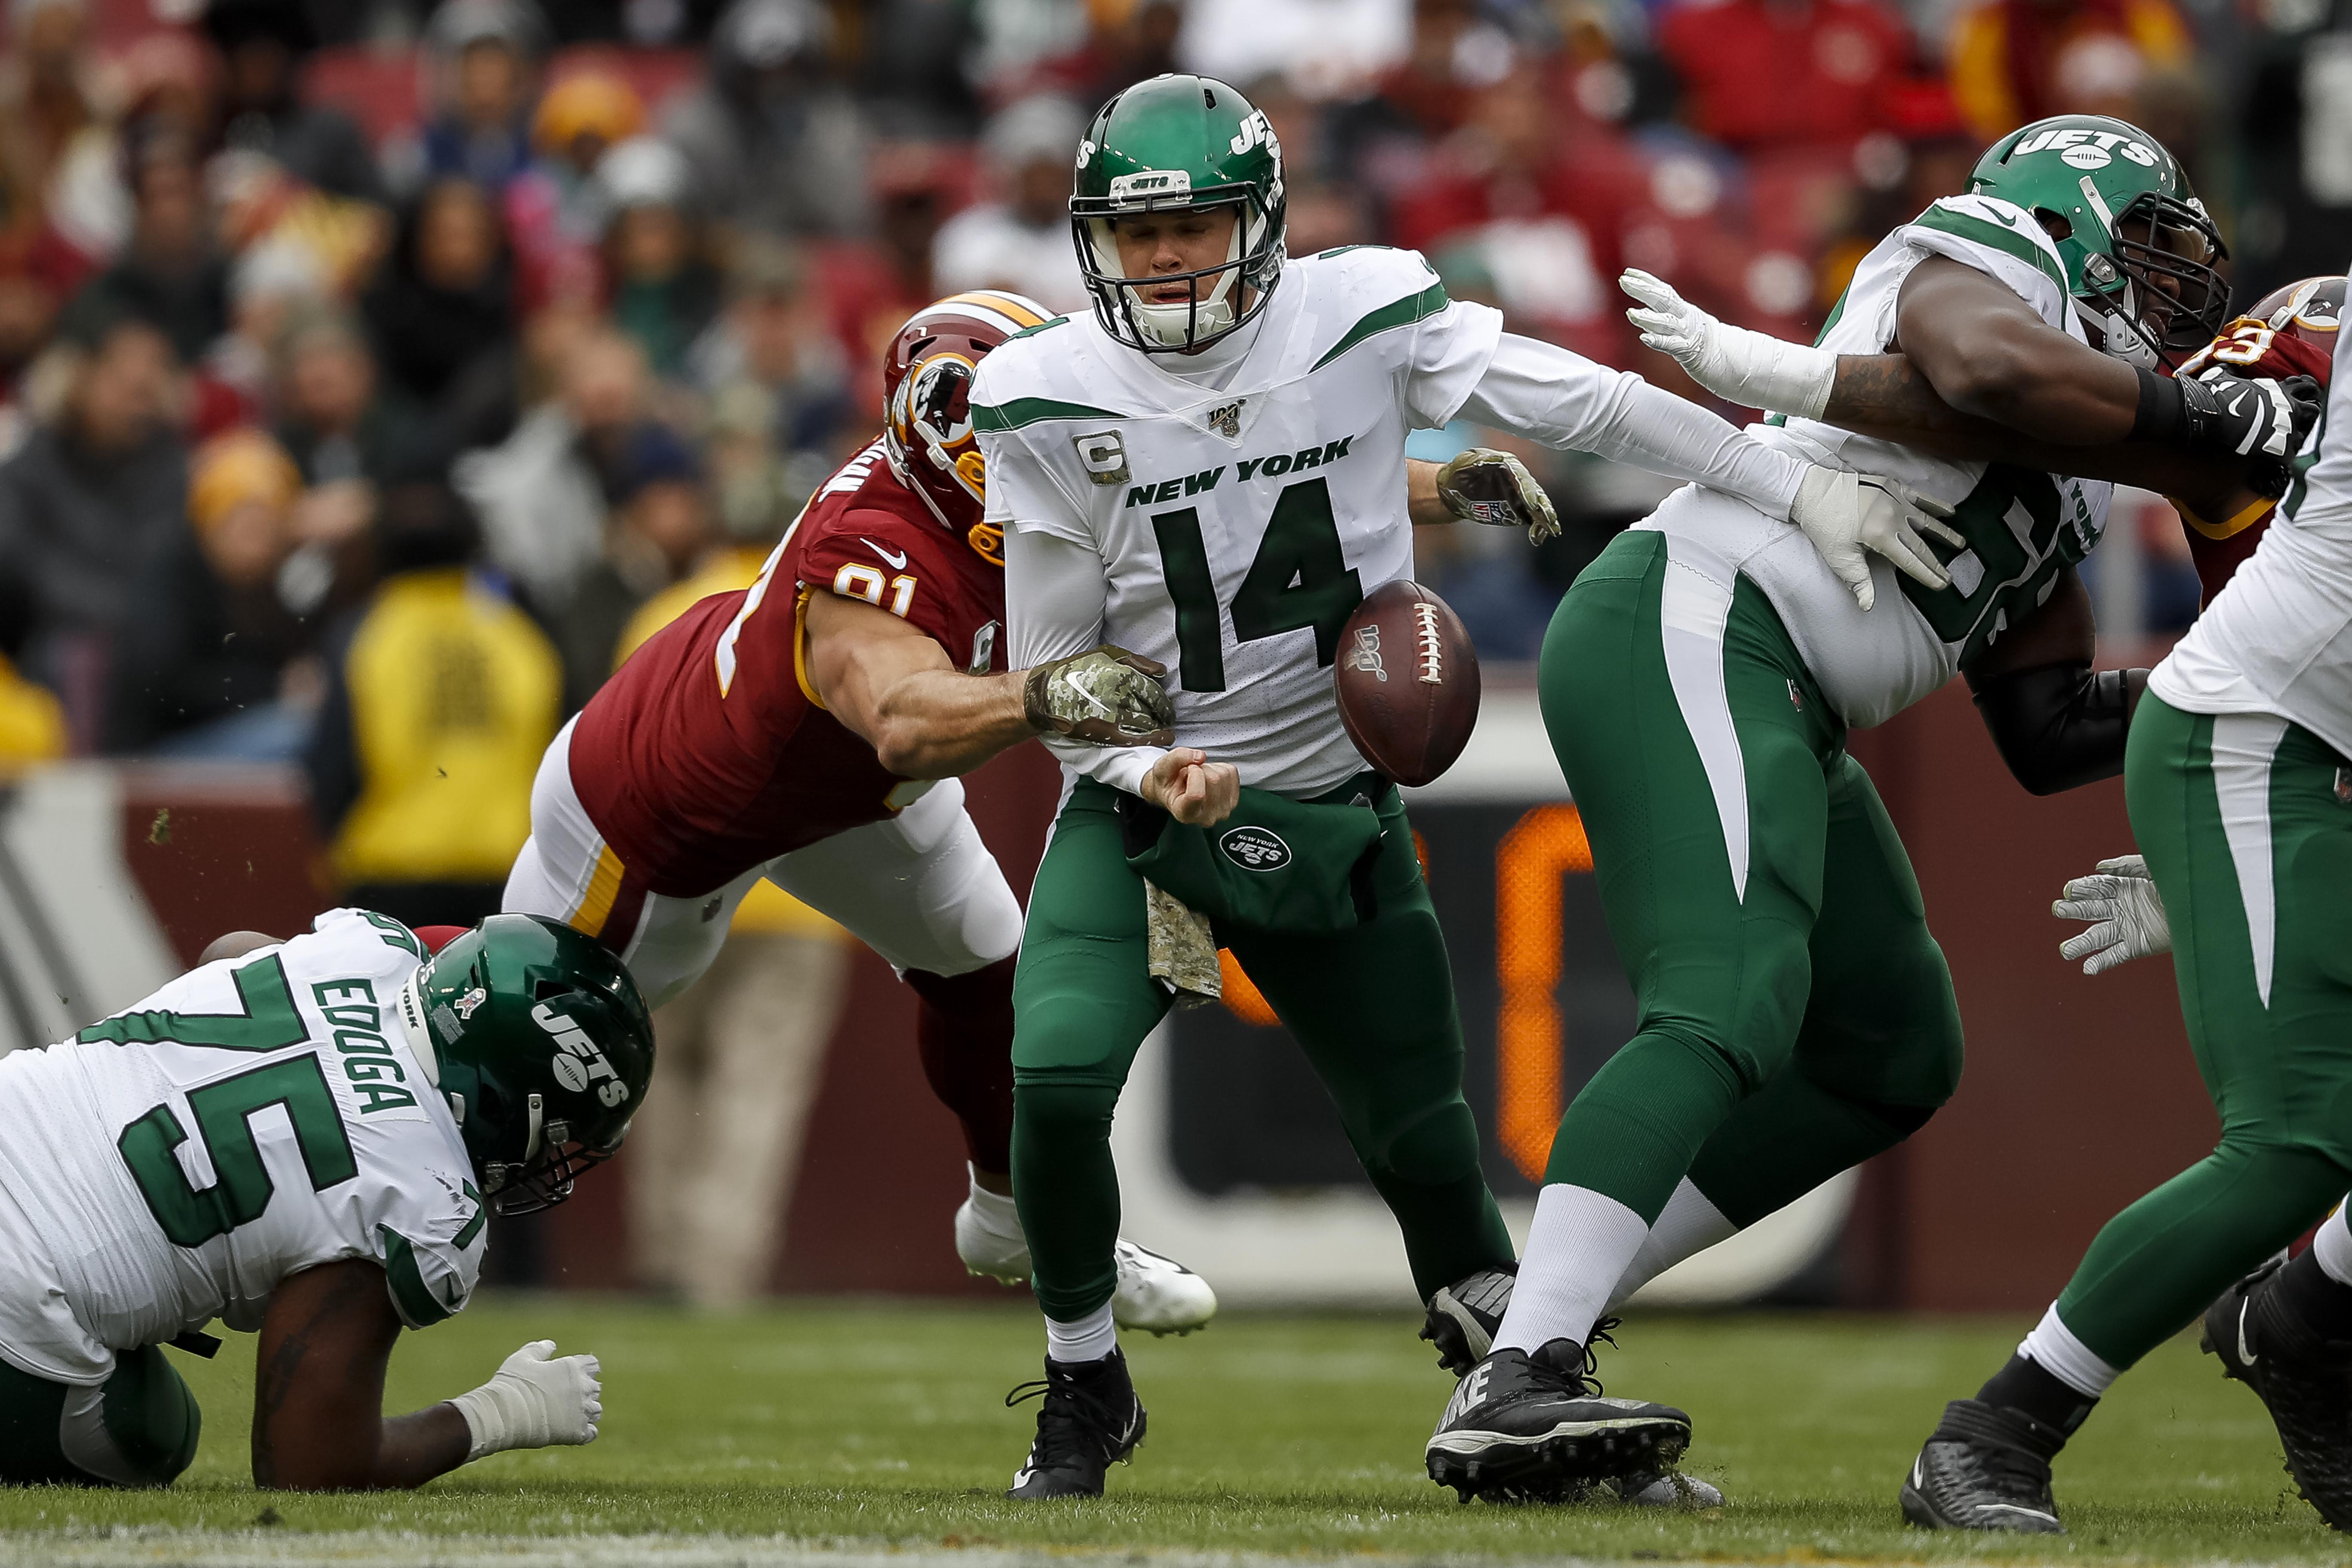 New York Jets vWashington Redskins